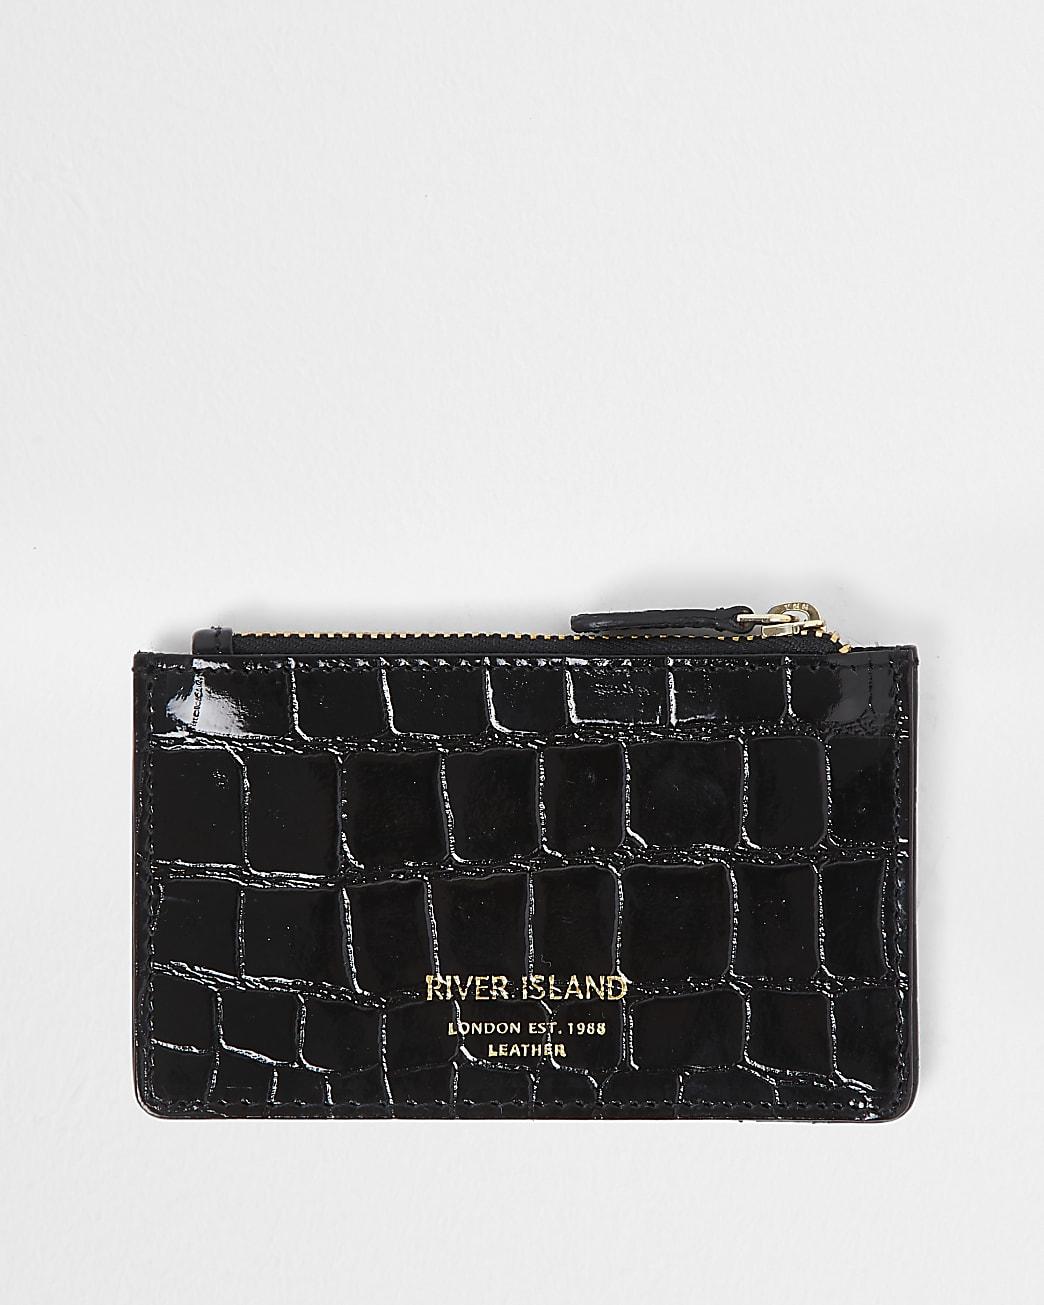 Black leather croc embossed card holder purse